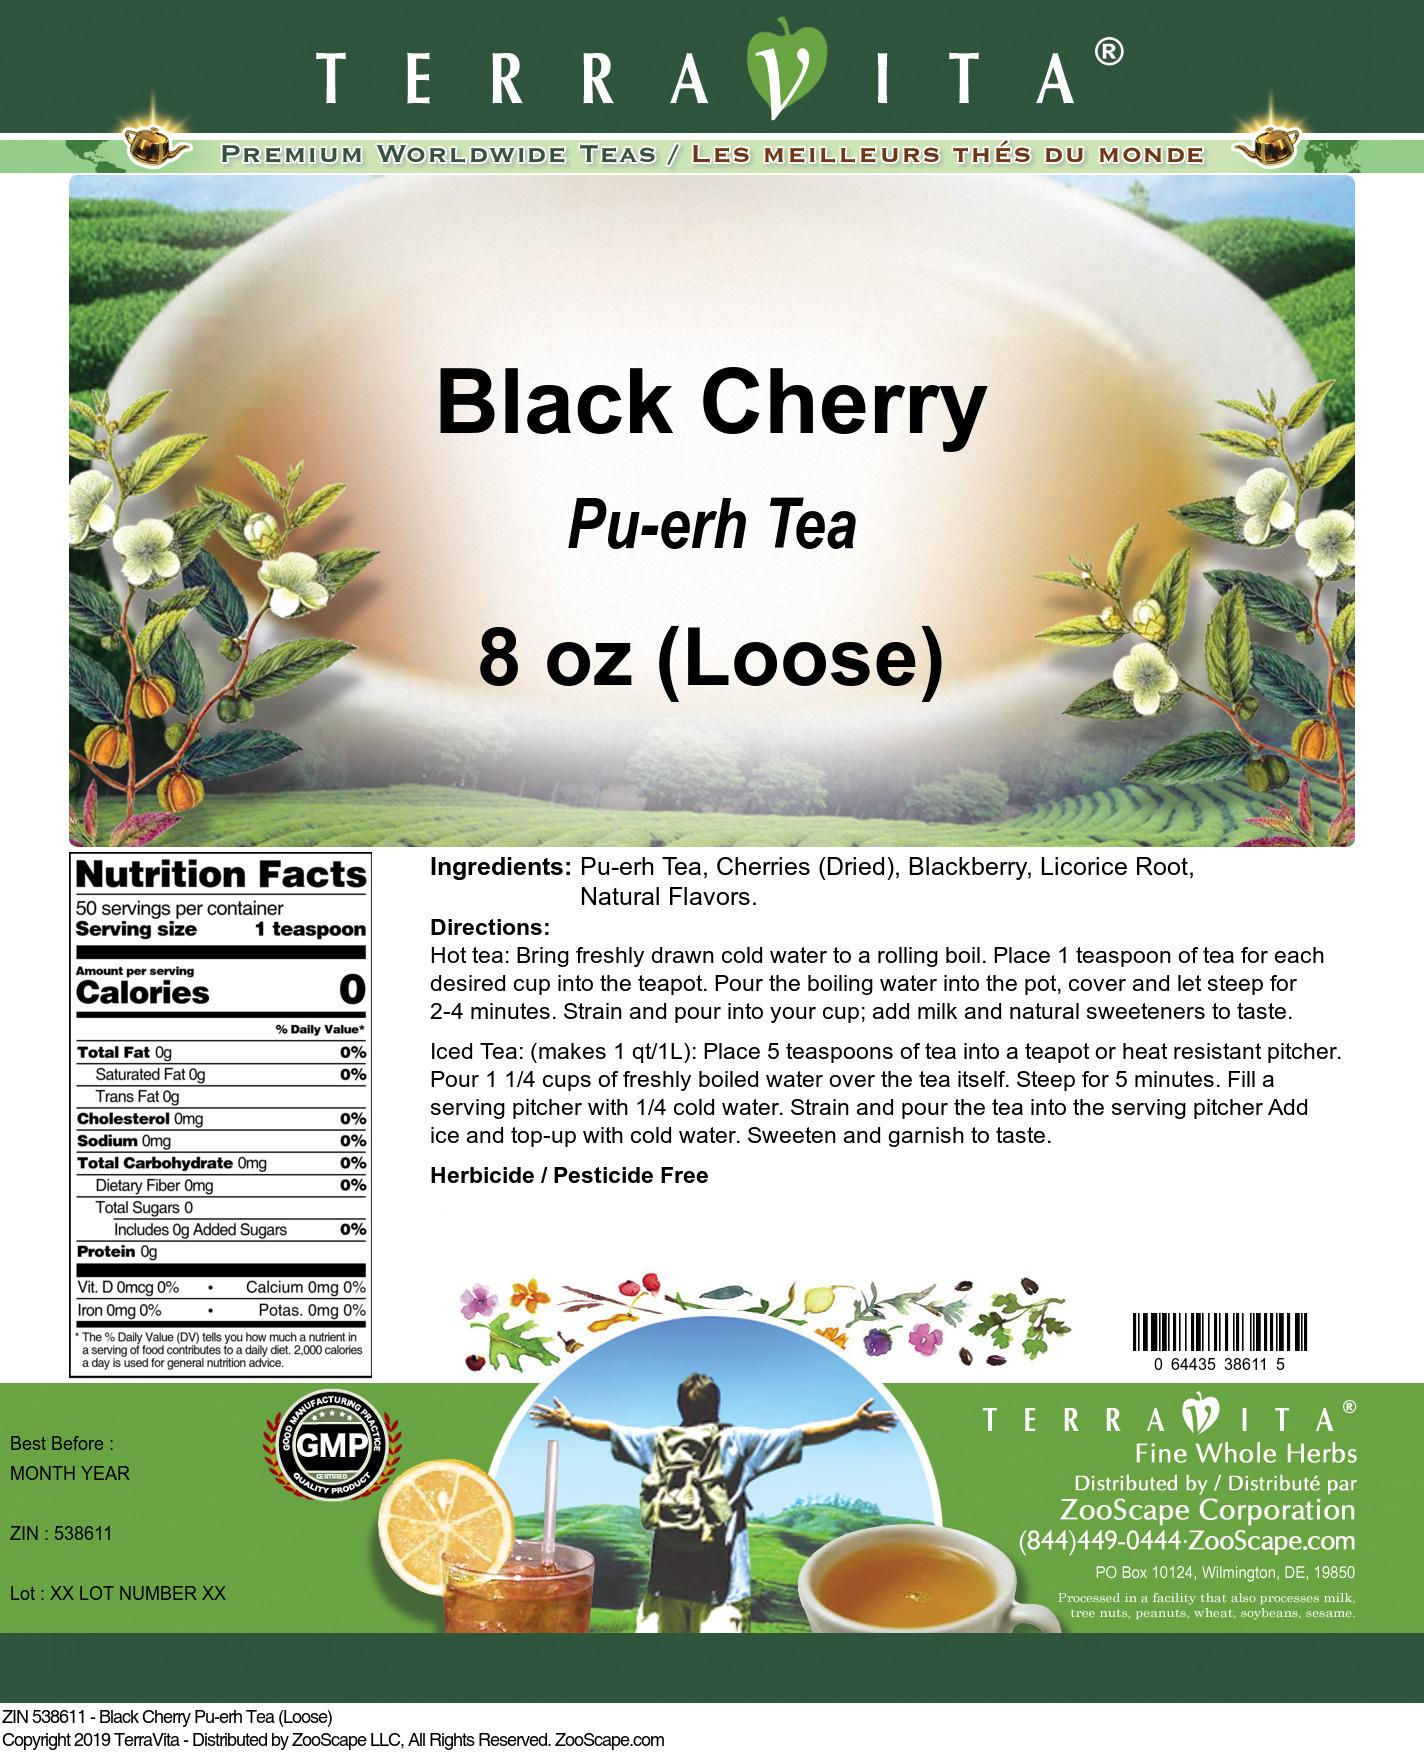 Black Cherry Pu-erh Tea